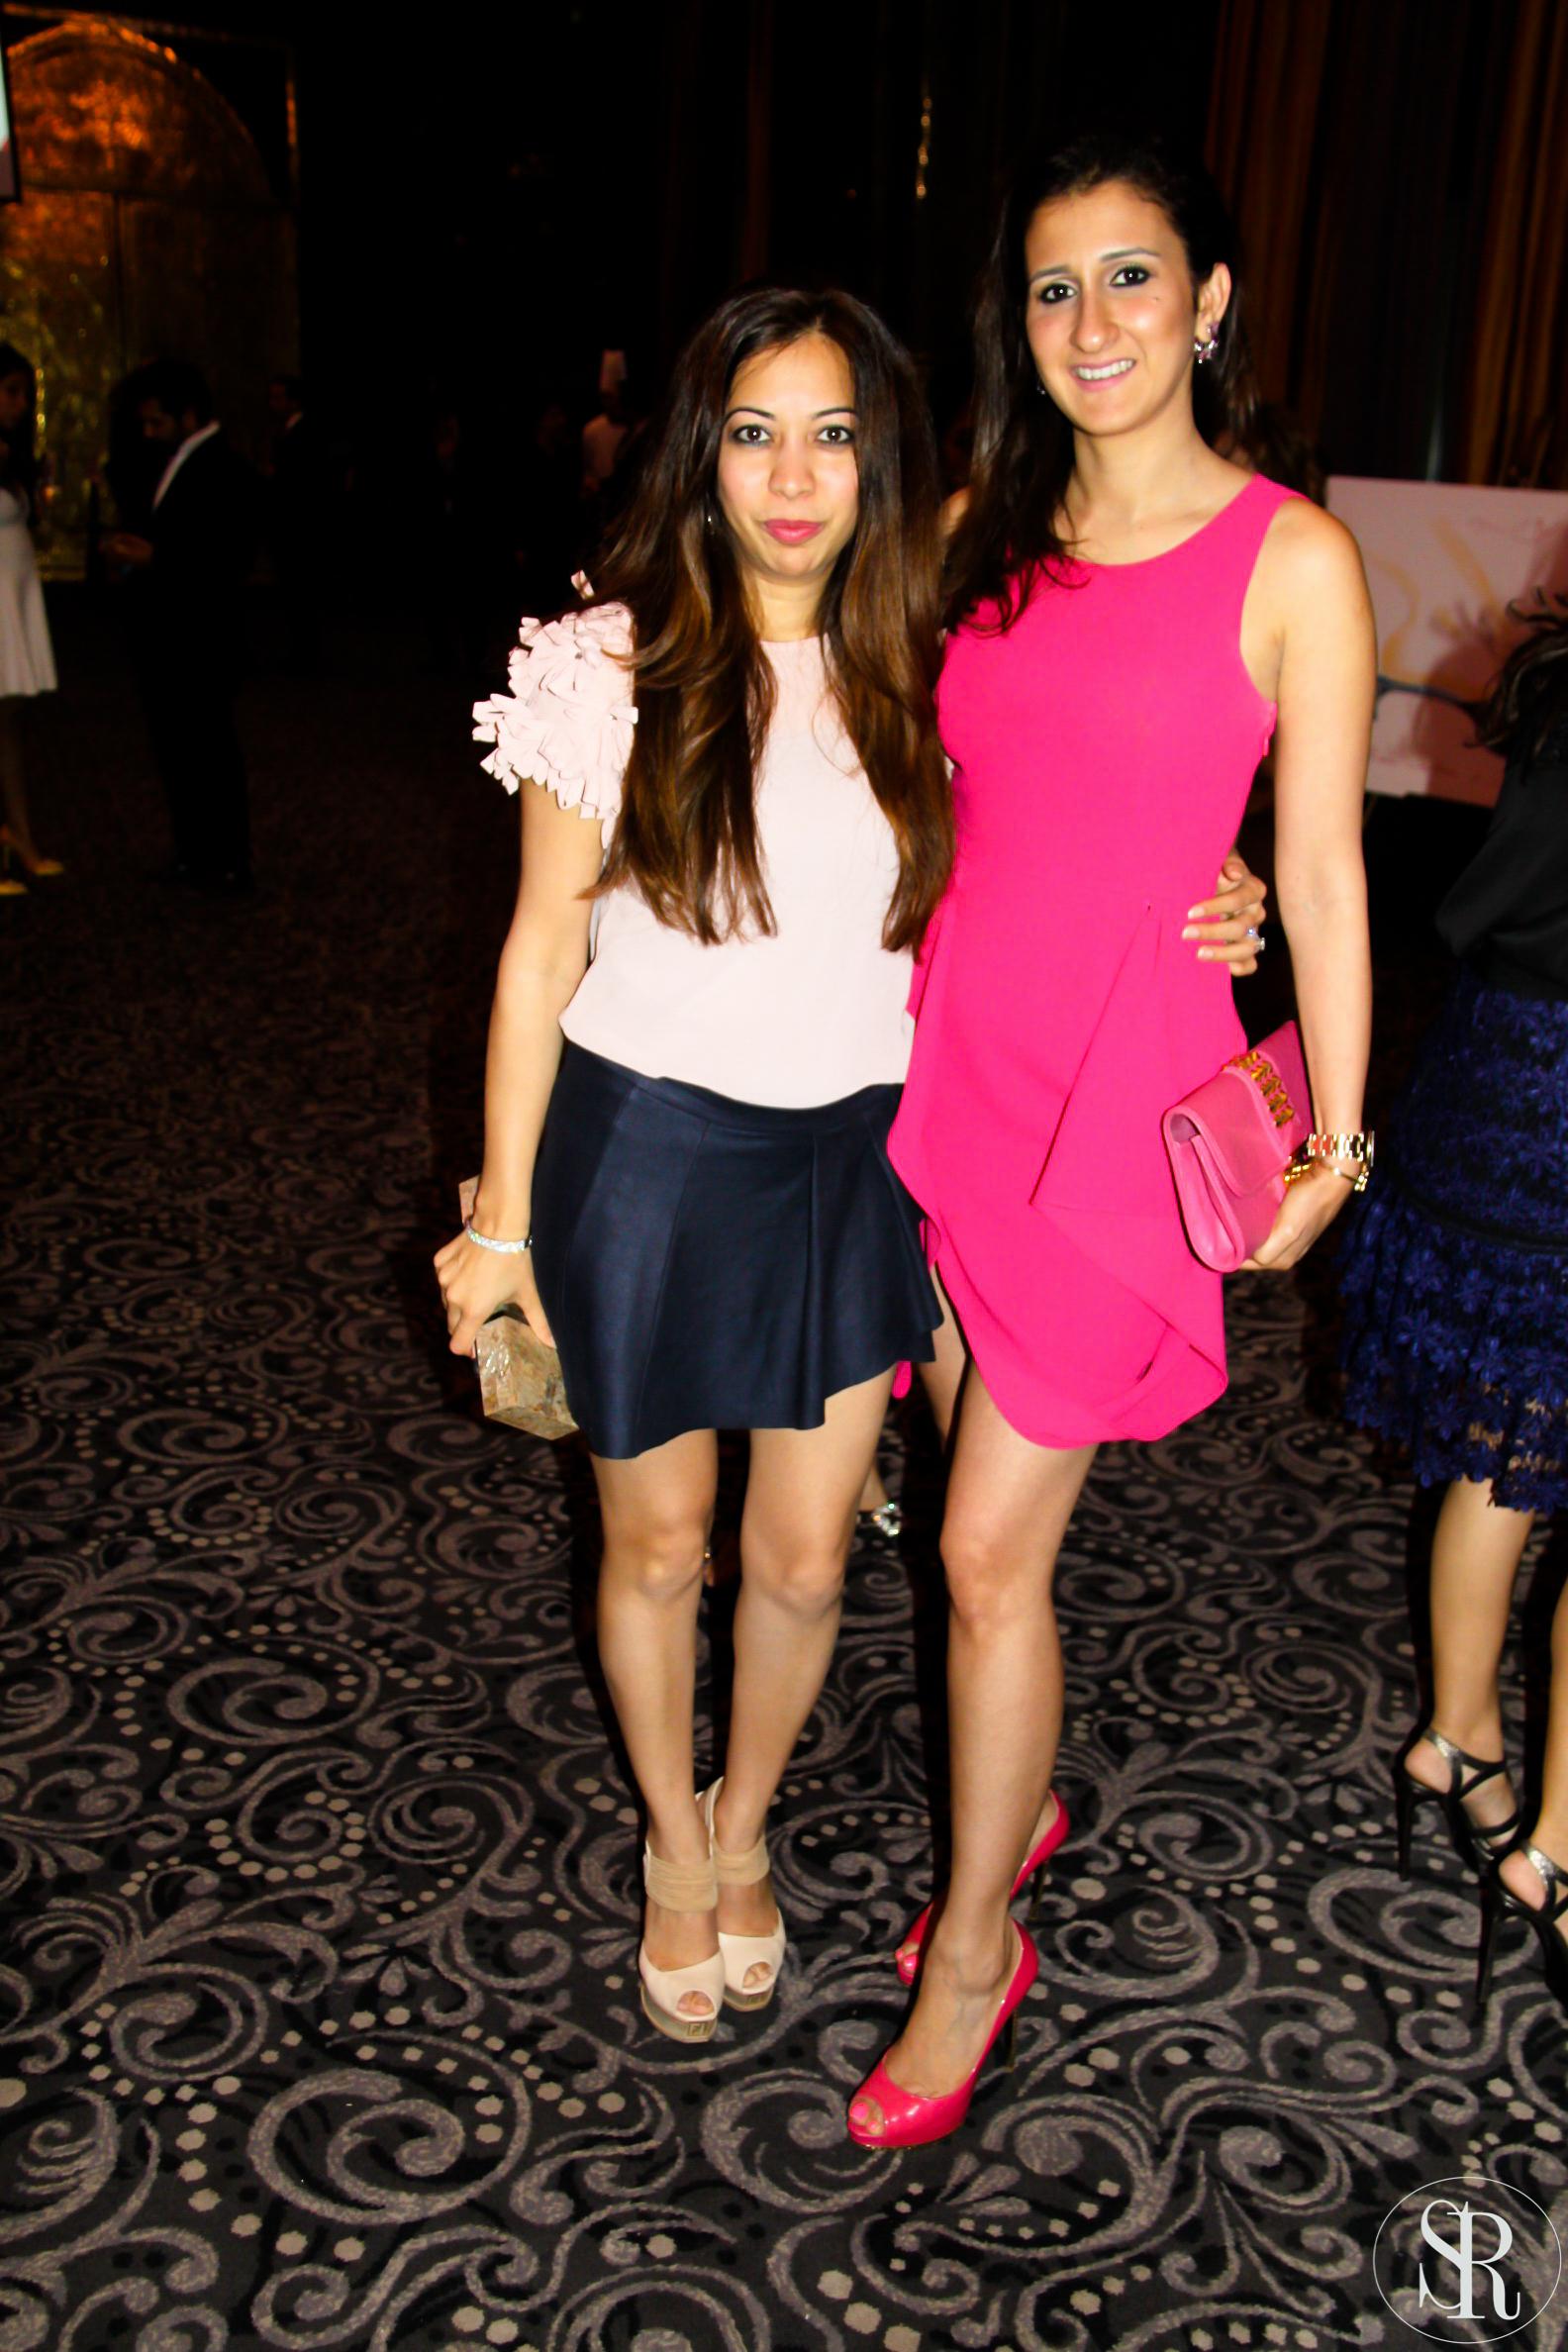 VIP launch of MANOLO BLAHNIK collection Fashion Afternoon Tea by Raffles Dubai-4225.jpg